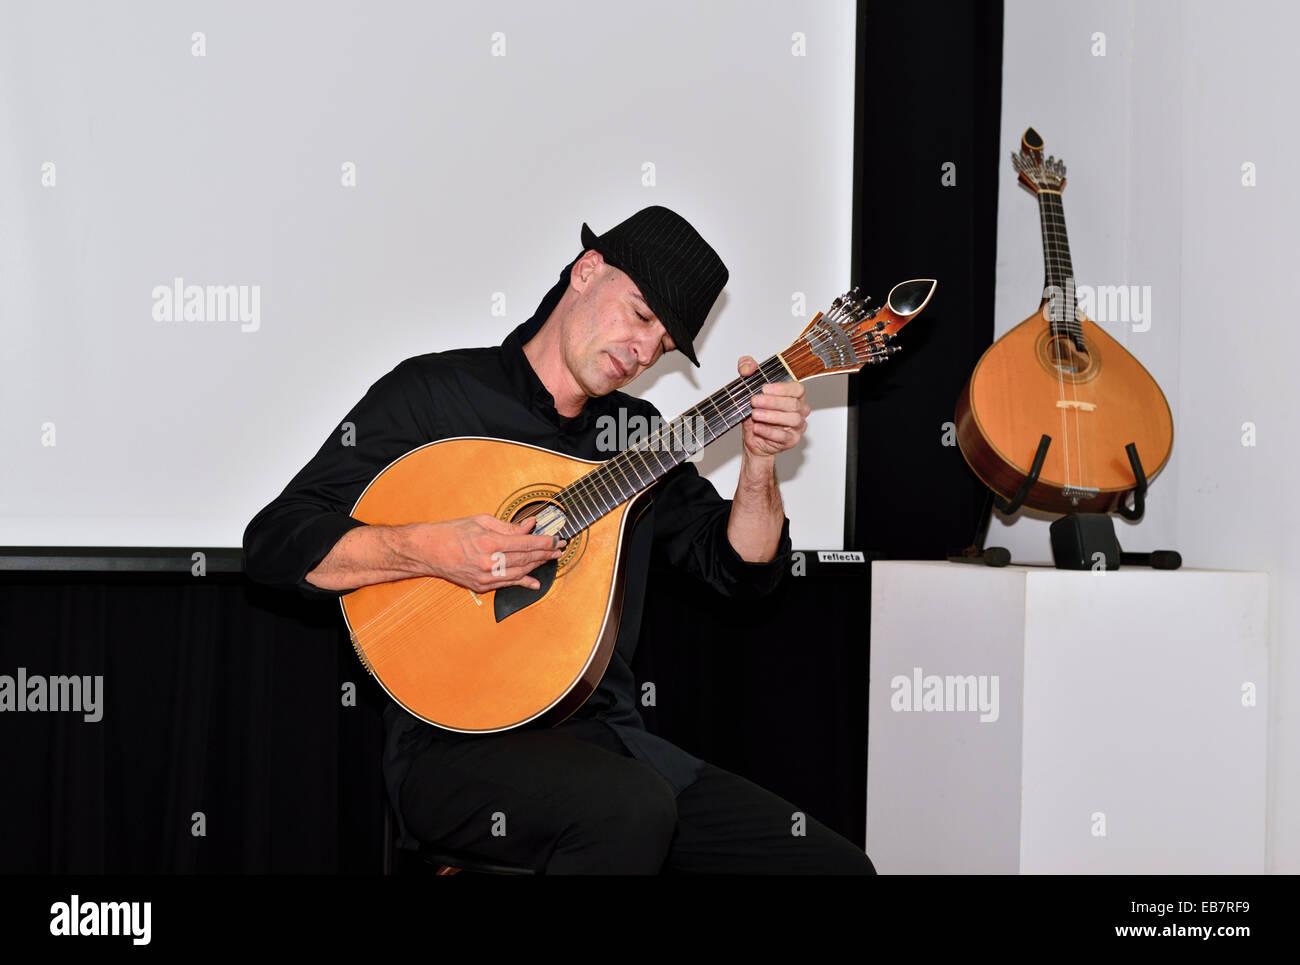 Portugal, Algarve: Musician João Cuña playing the Guitarra Portuguesa in his show in the Museu Municipal - Stock Image